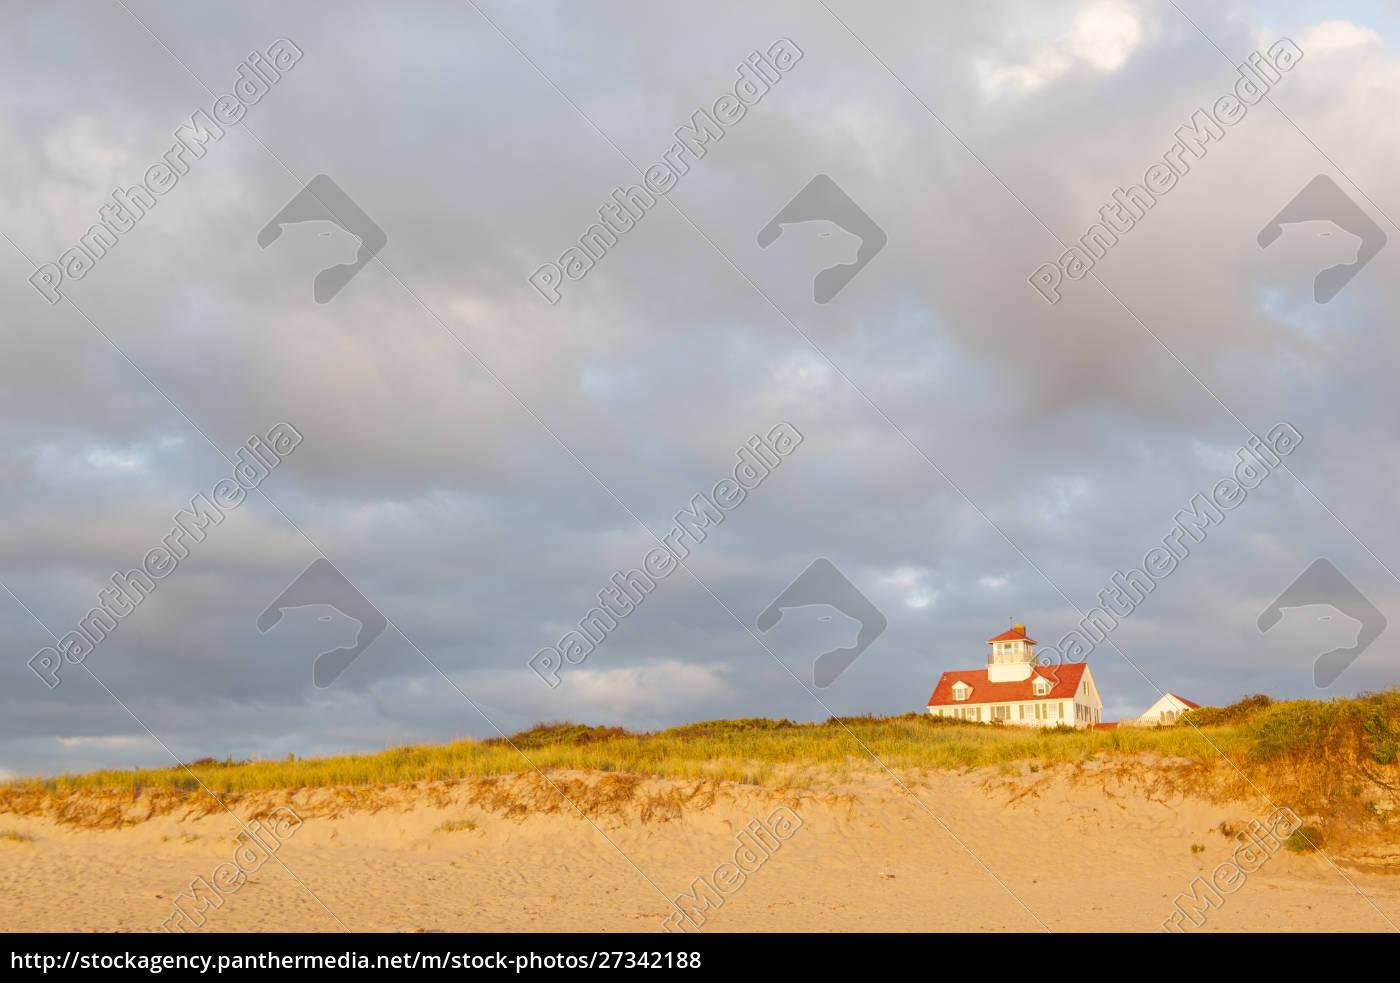 ehemalige, lebensrettungsstation, am, coast, guard, beach - 27342188